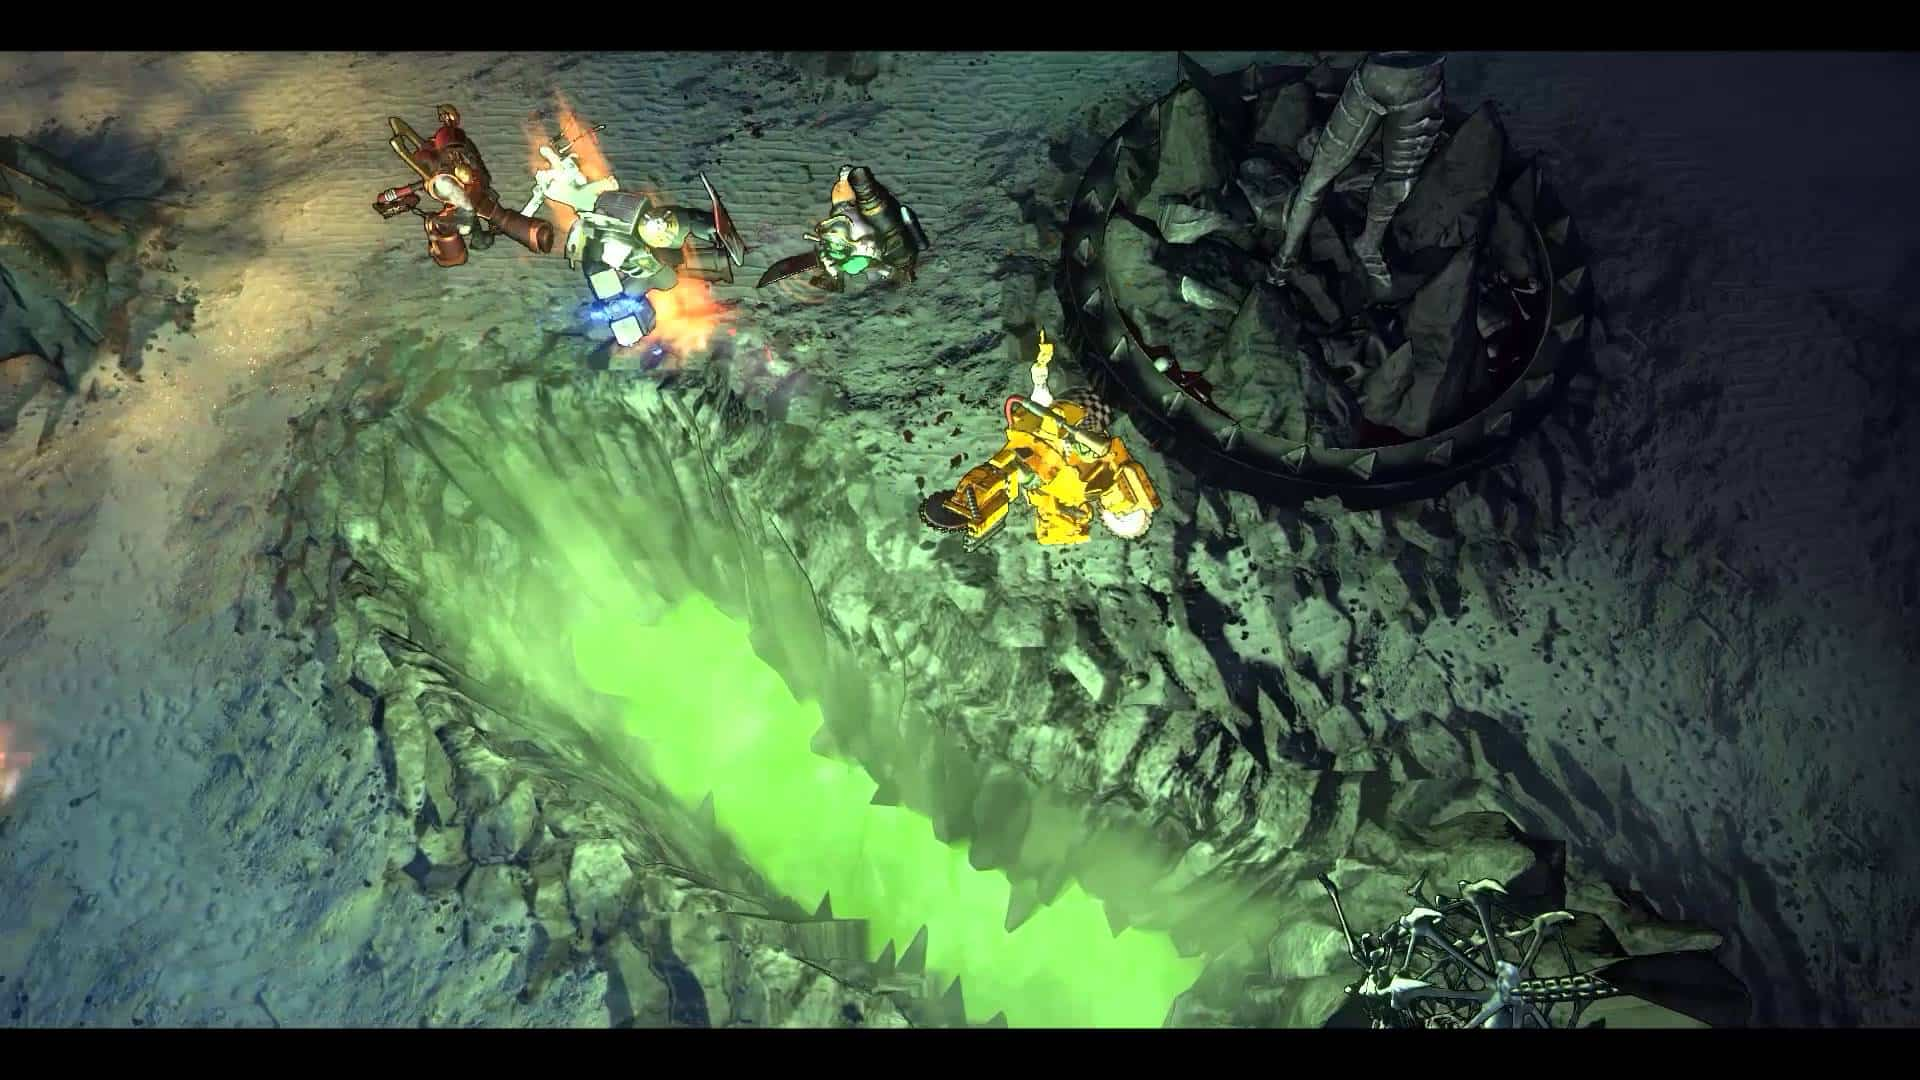 Warhammer 40k's Upcoming MOBA Hits Early Access December 9th